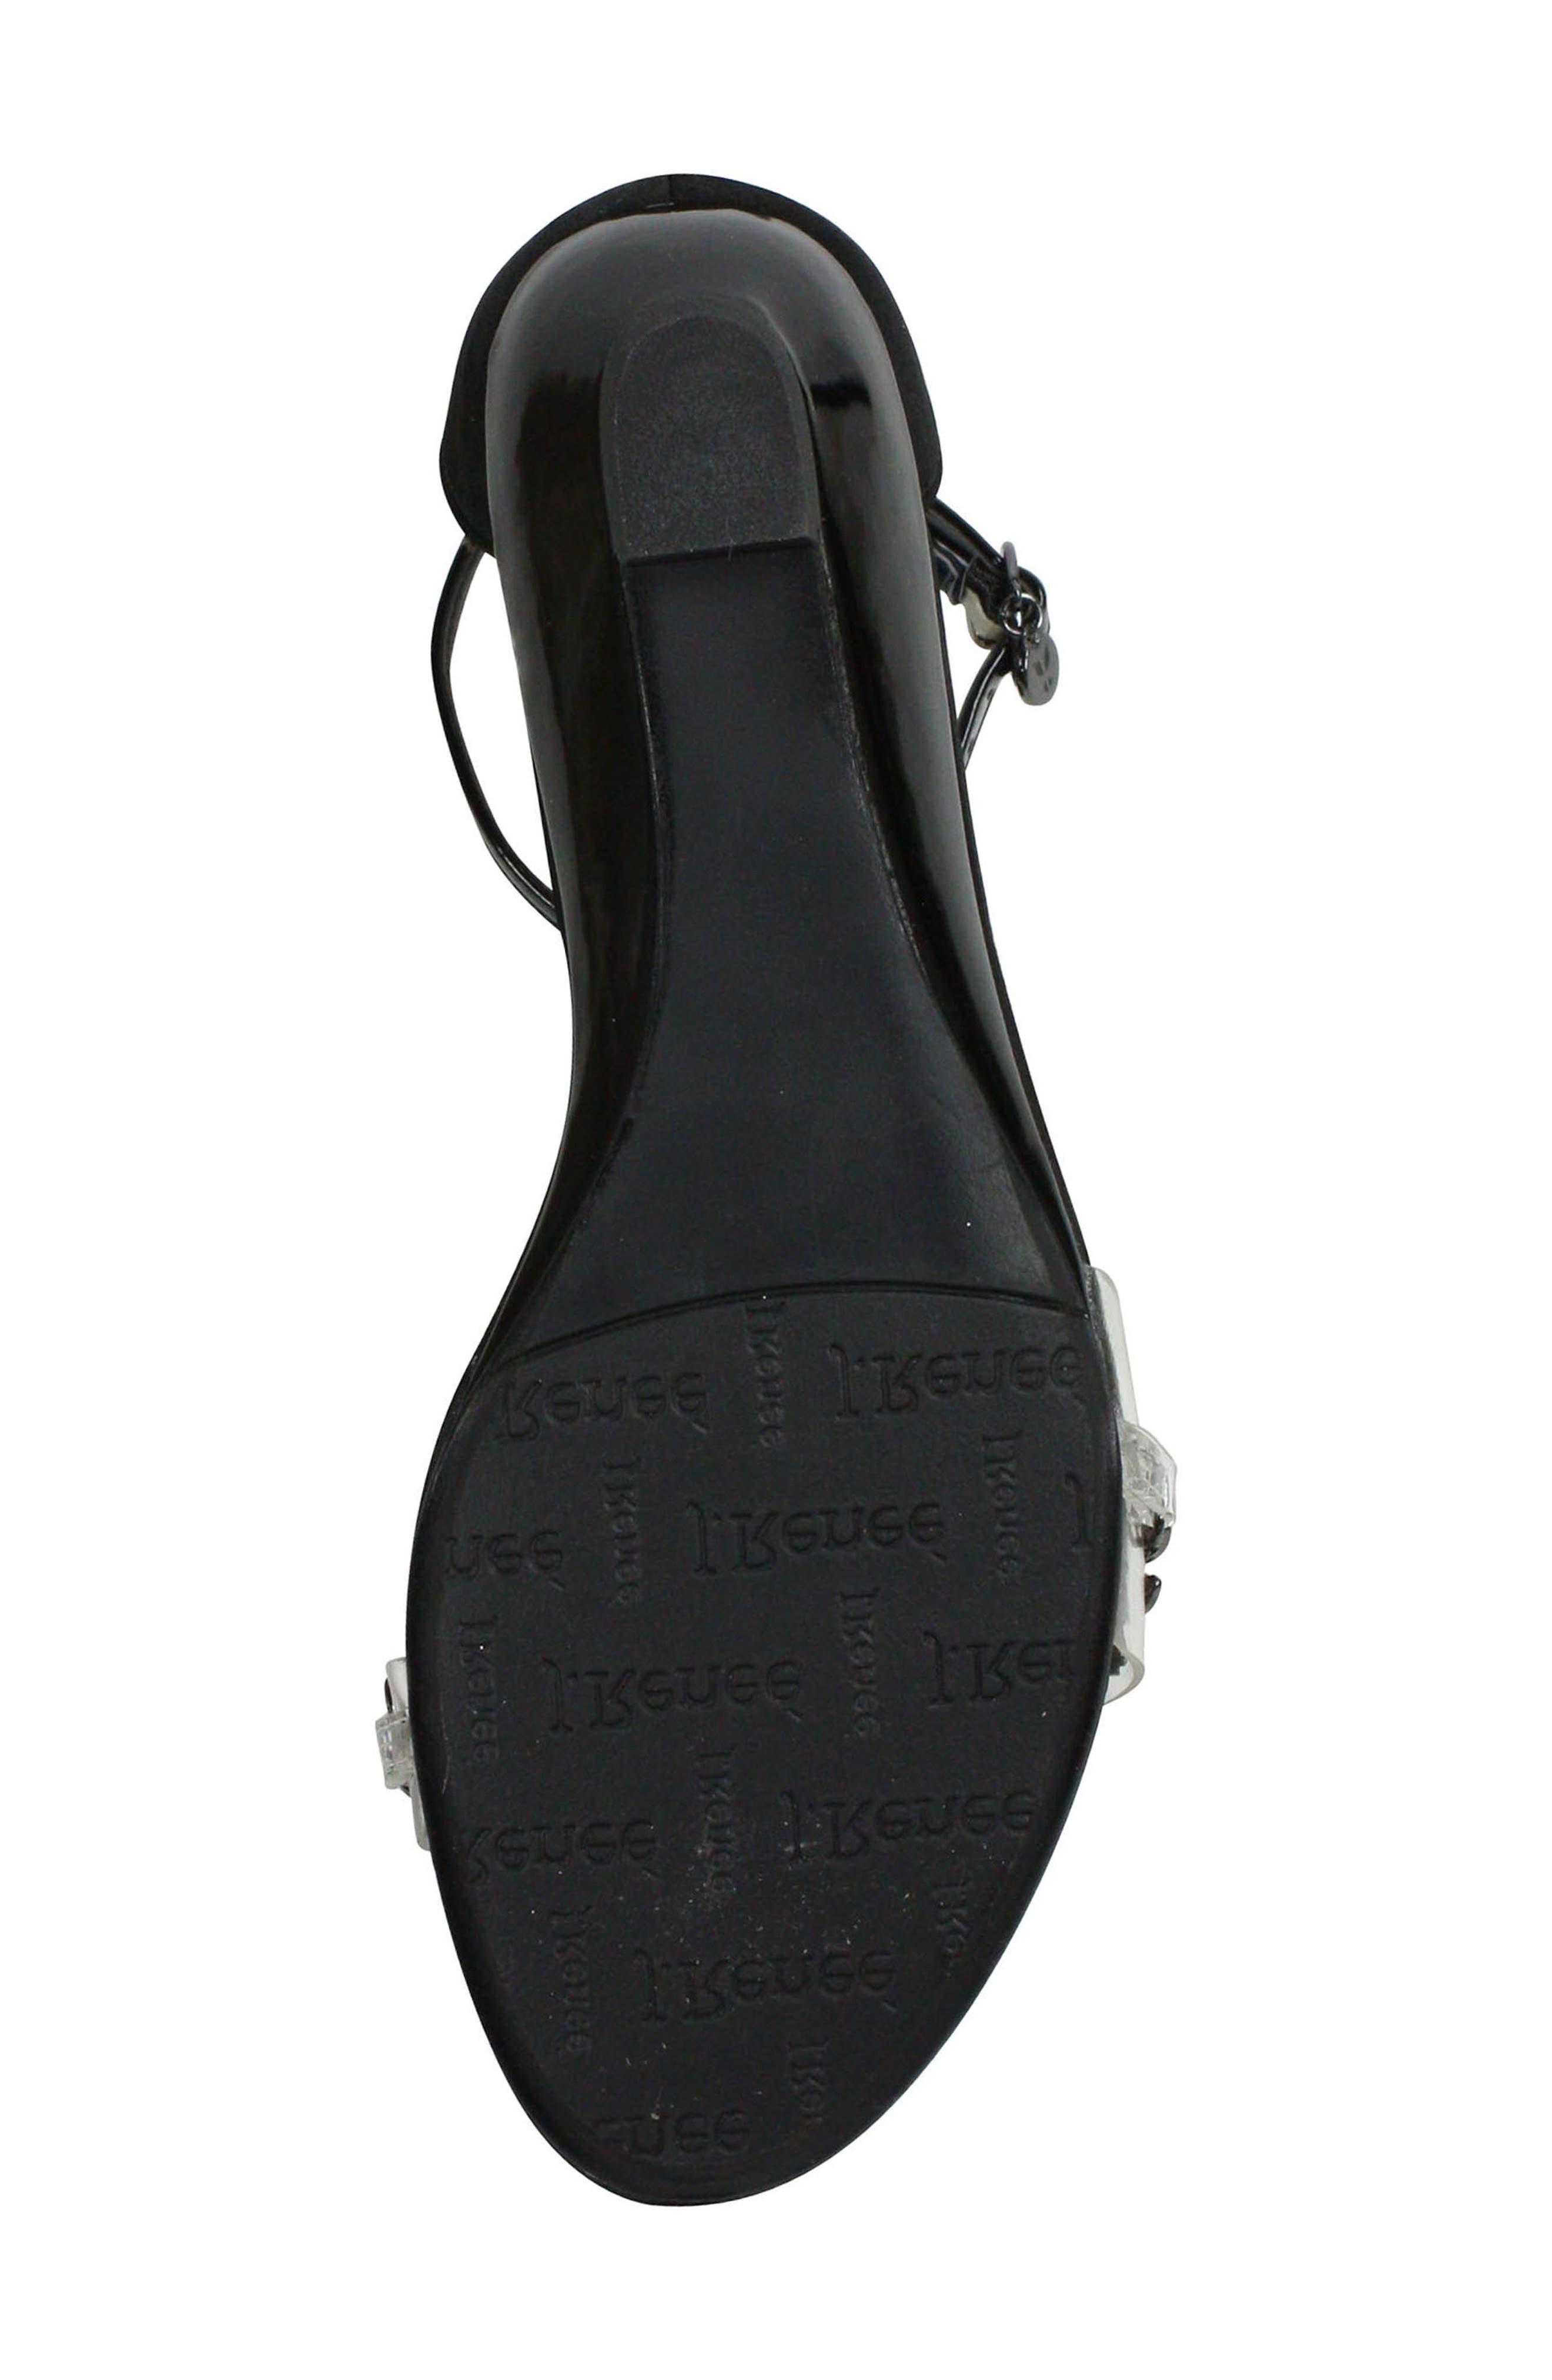 Evania Ankle Strap Sandal,                             Alternate thumbnail 6, color,                             BLACK SATIN